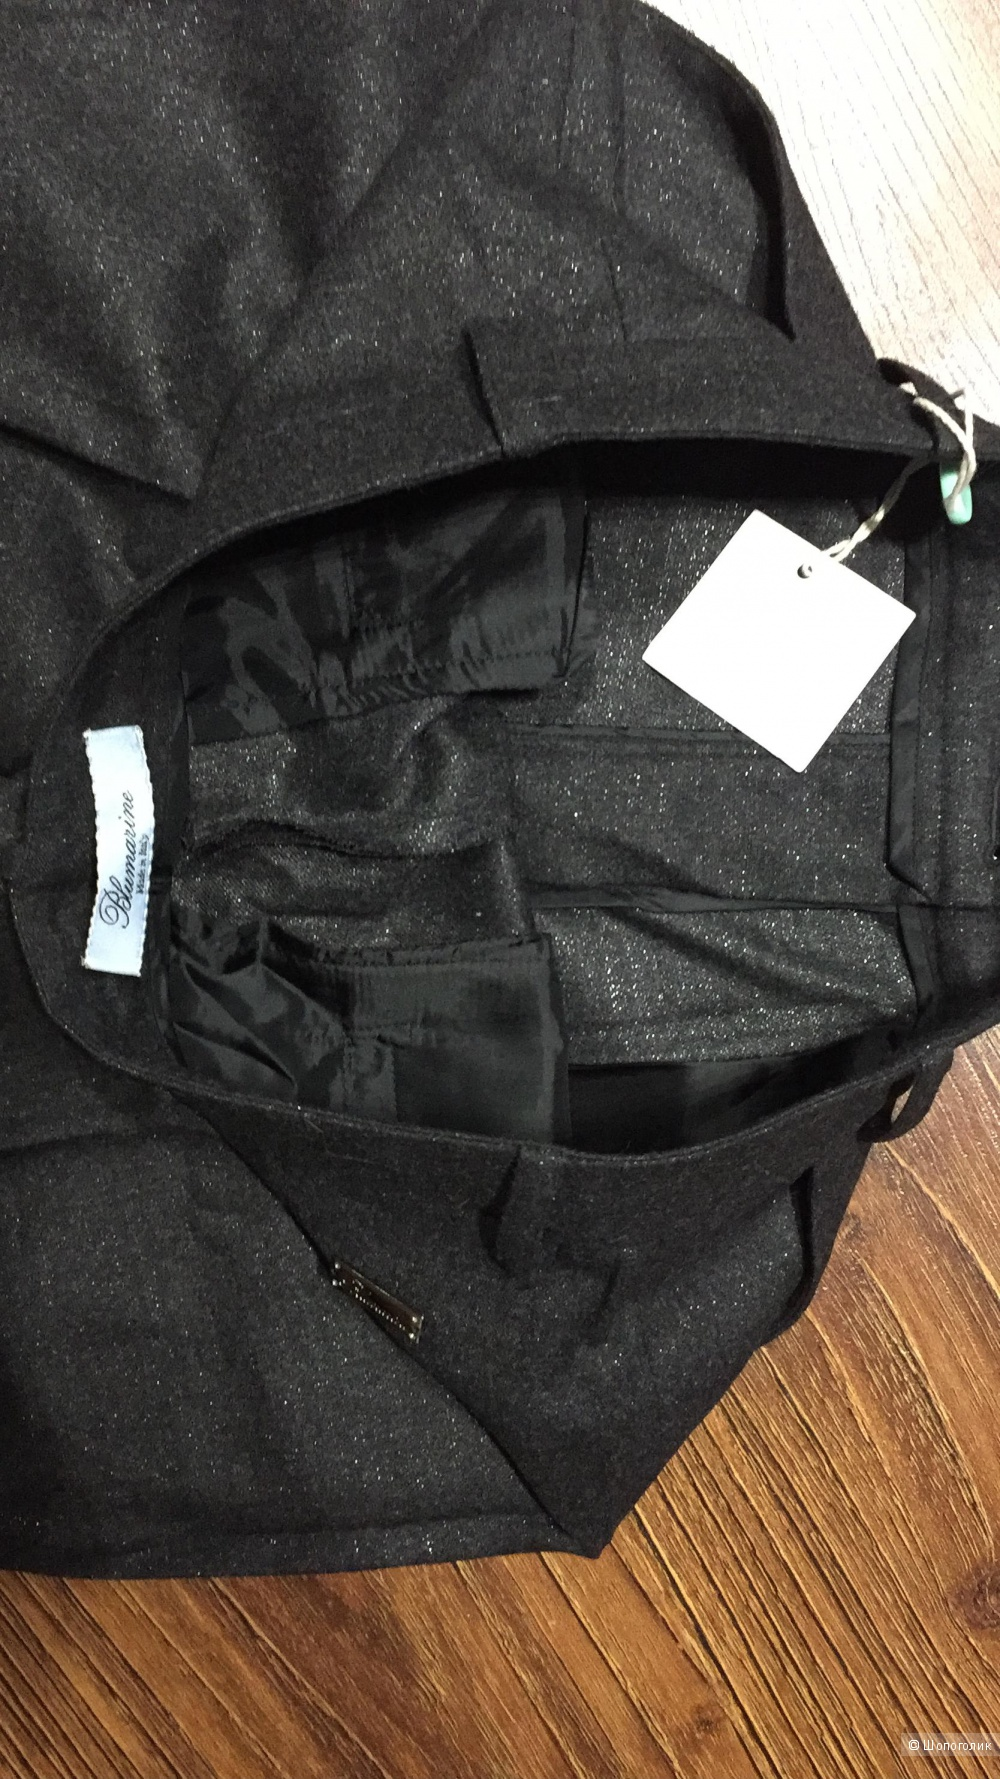 Шерстяные женские брюки BLUMARINE . р.44